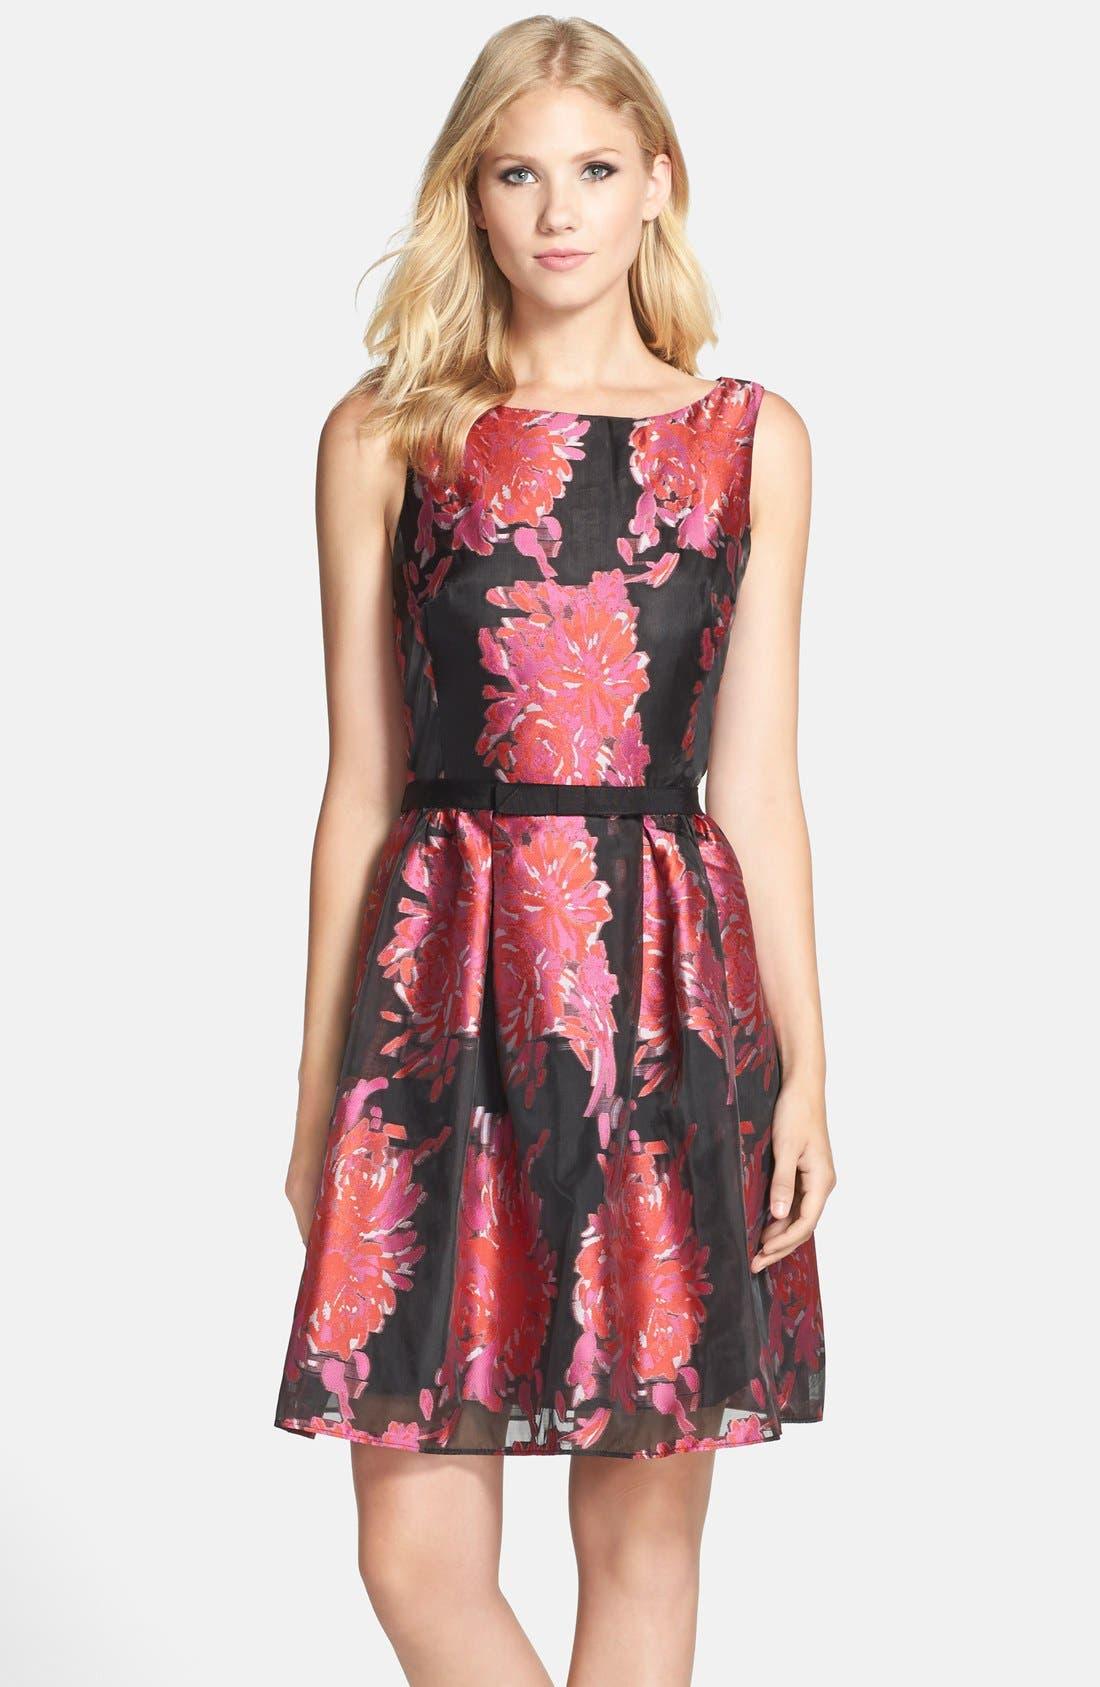 Alternate Image 1 Selected - Taylor Dresses Floral Burnout Organza Fit & Flare Dress